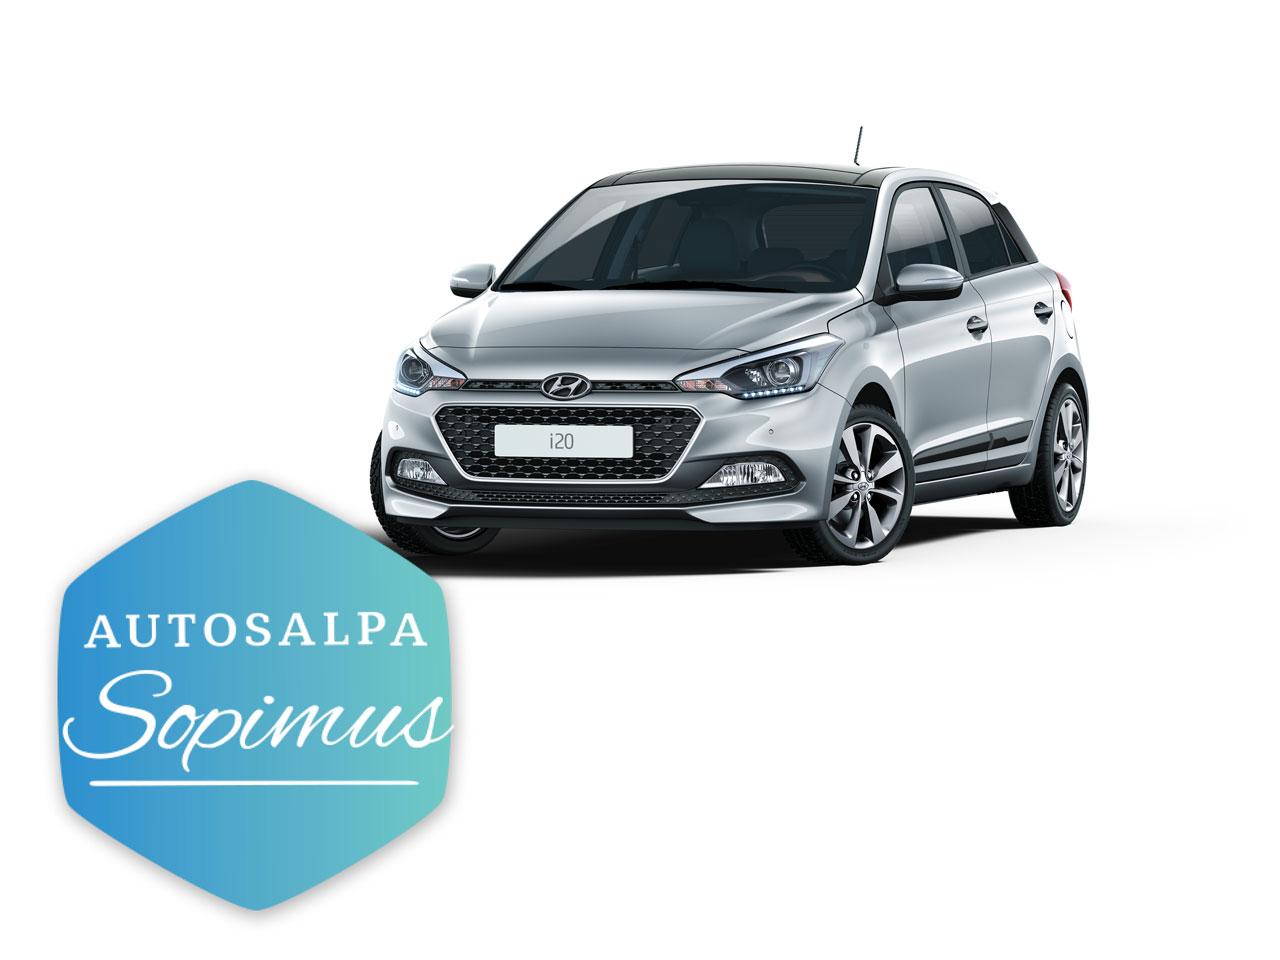 Hyundai i20 Hatchback automaatti esim. 229 € / kk